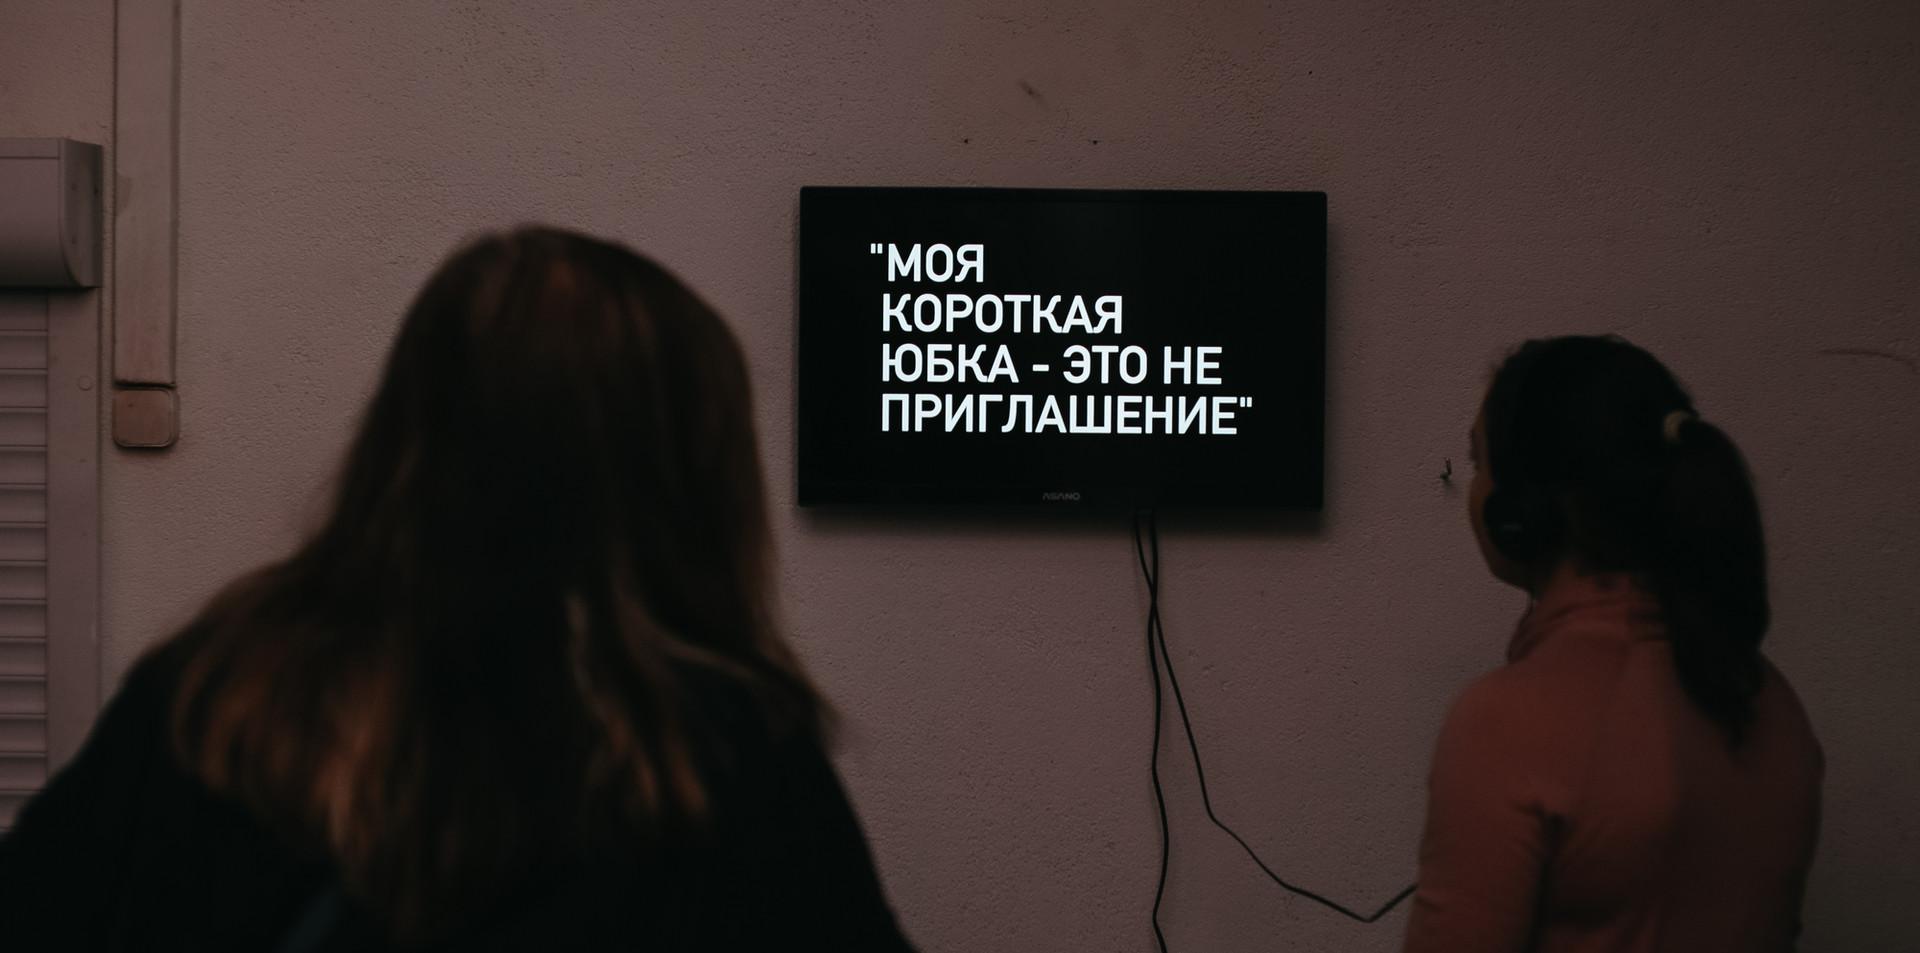 IMG_0870.jpg